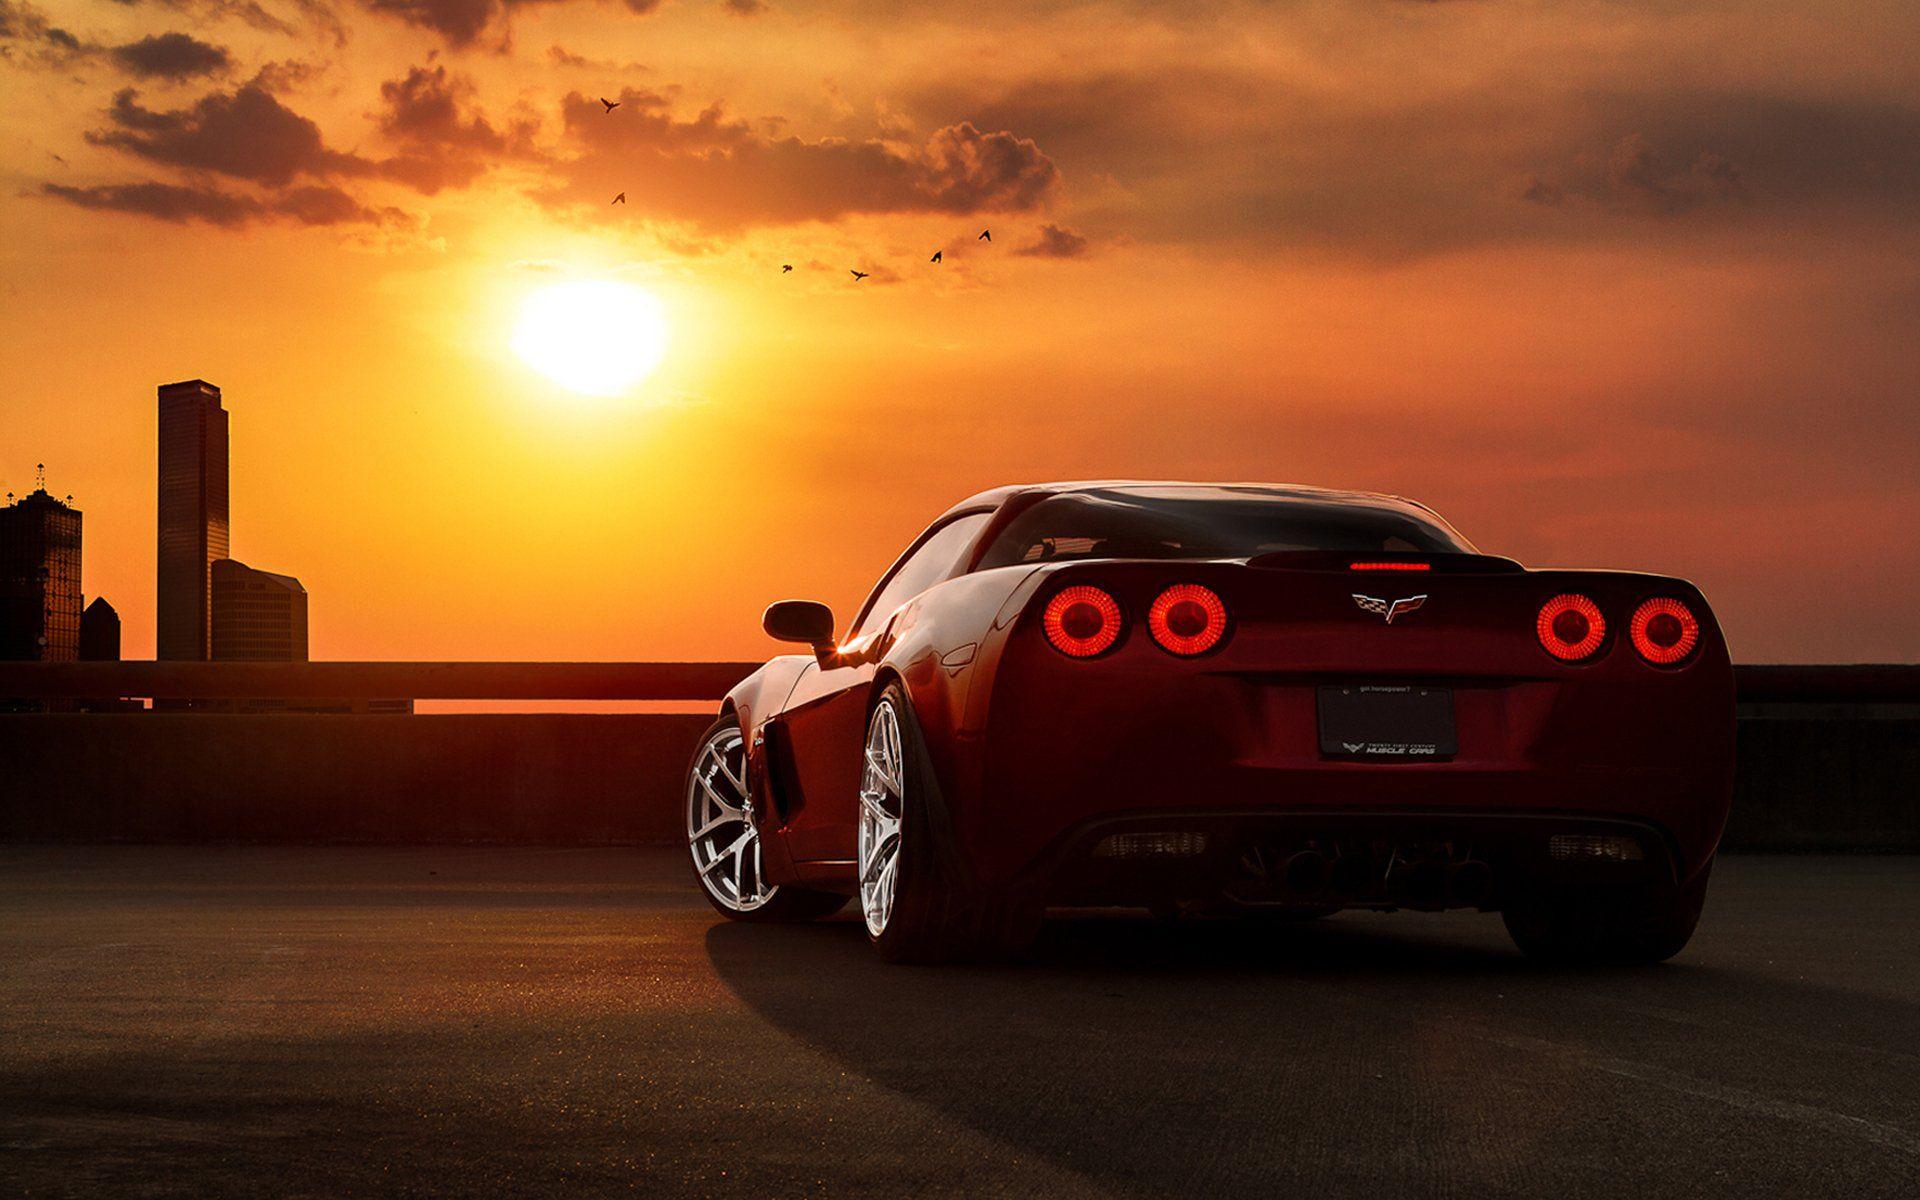 Corvette Wallpapers   Top Corvette Backgrounds   WallpaperAccess 1920x1200